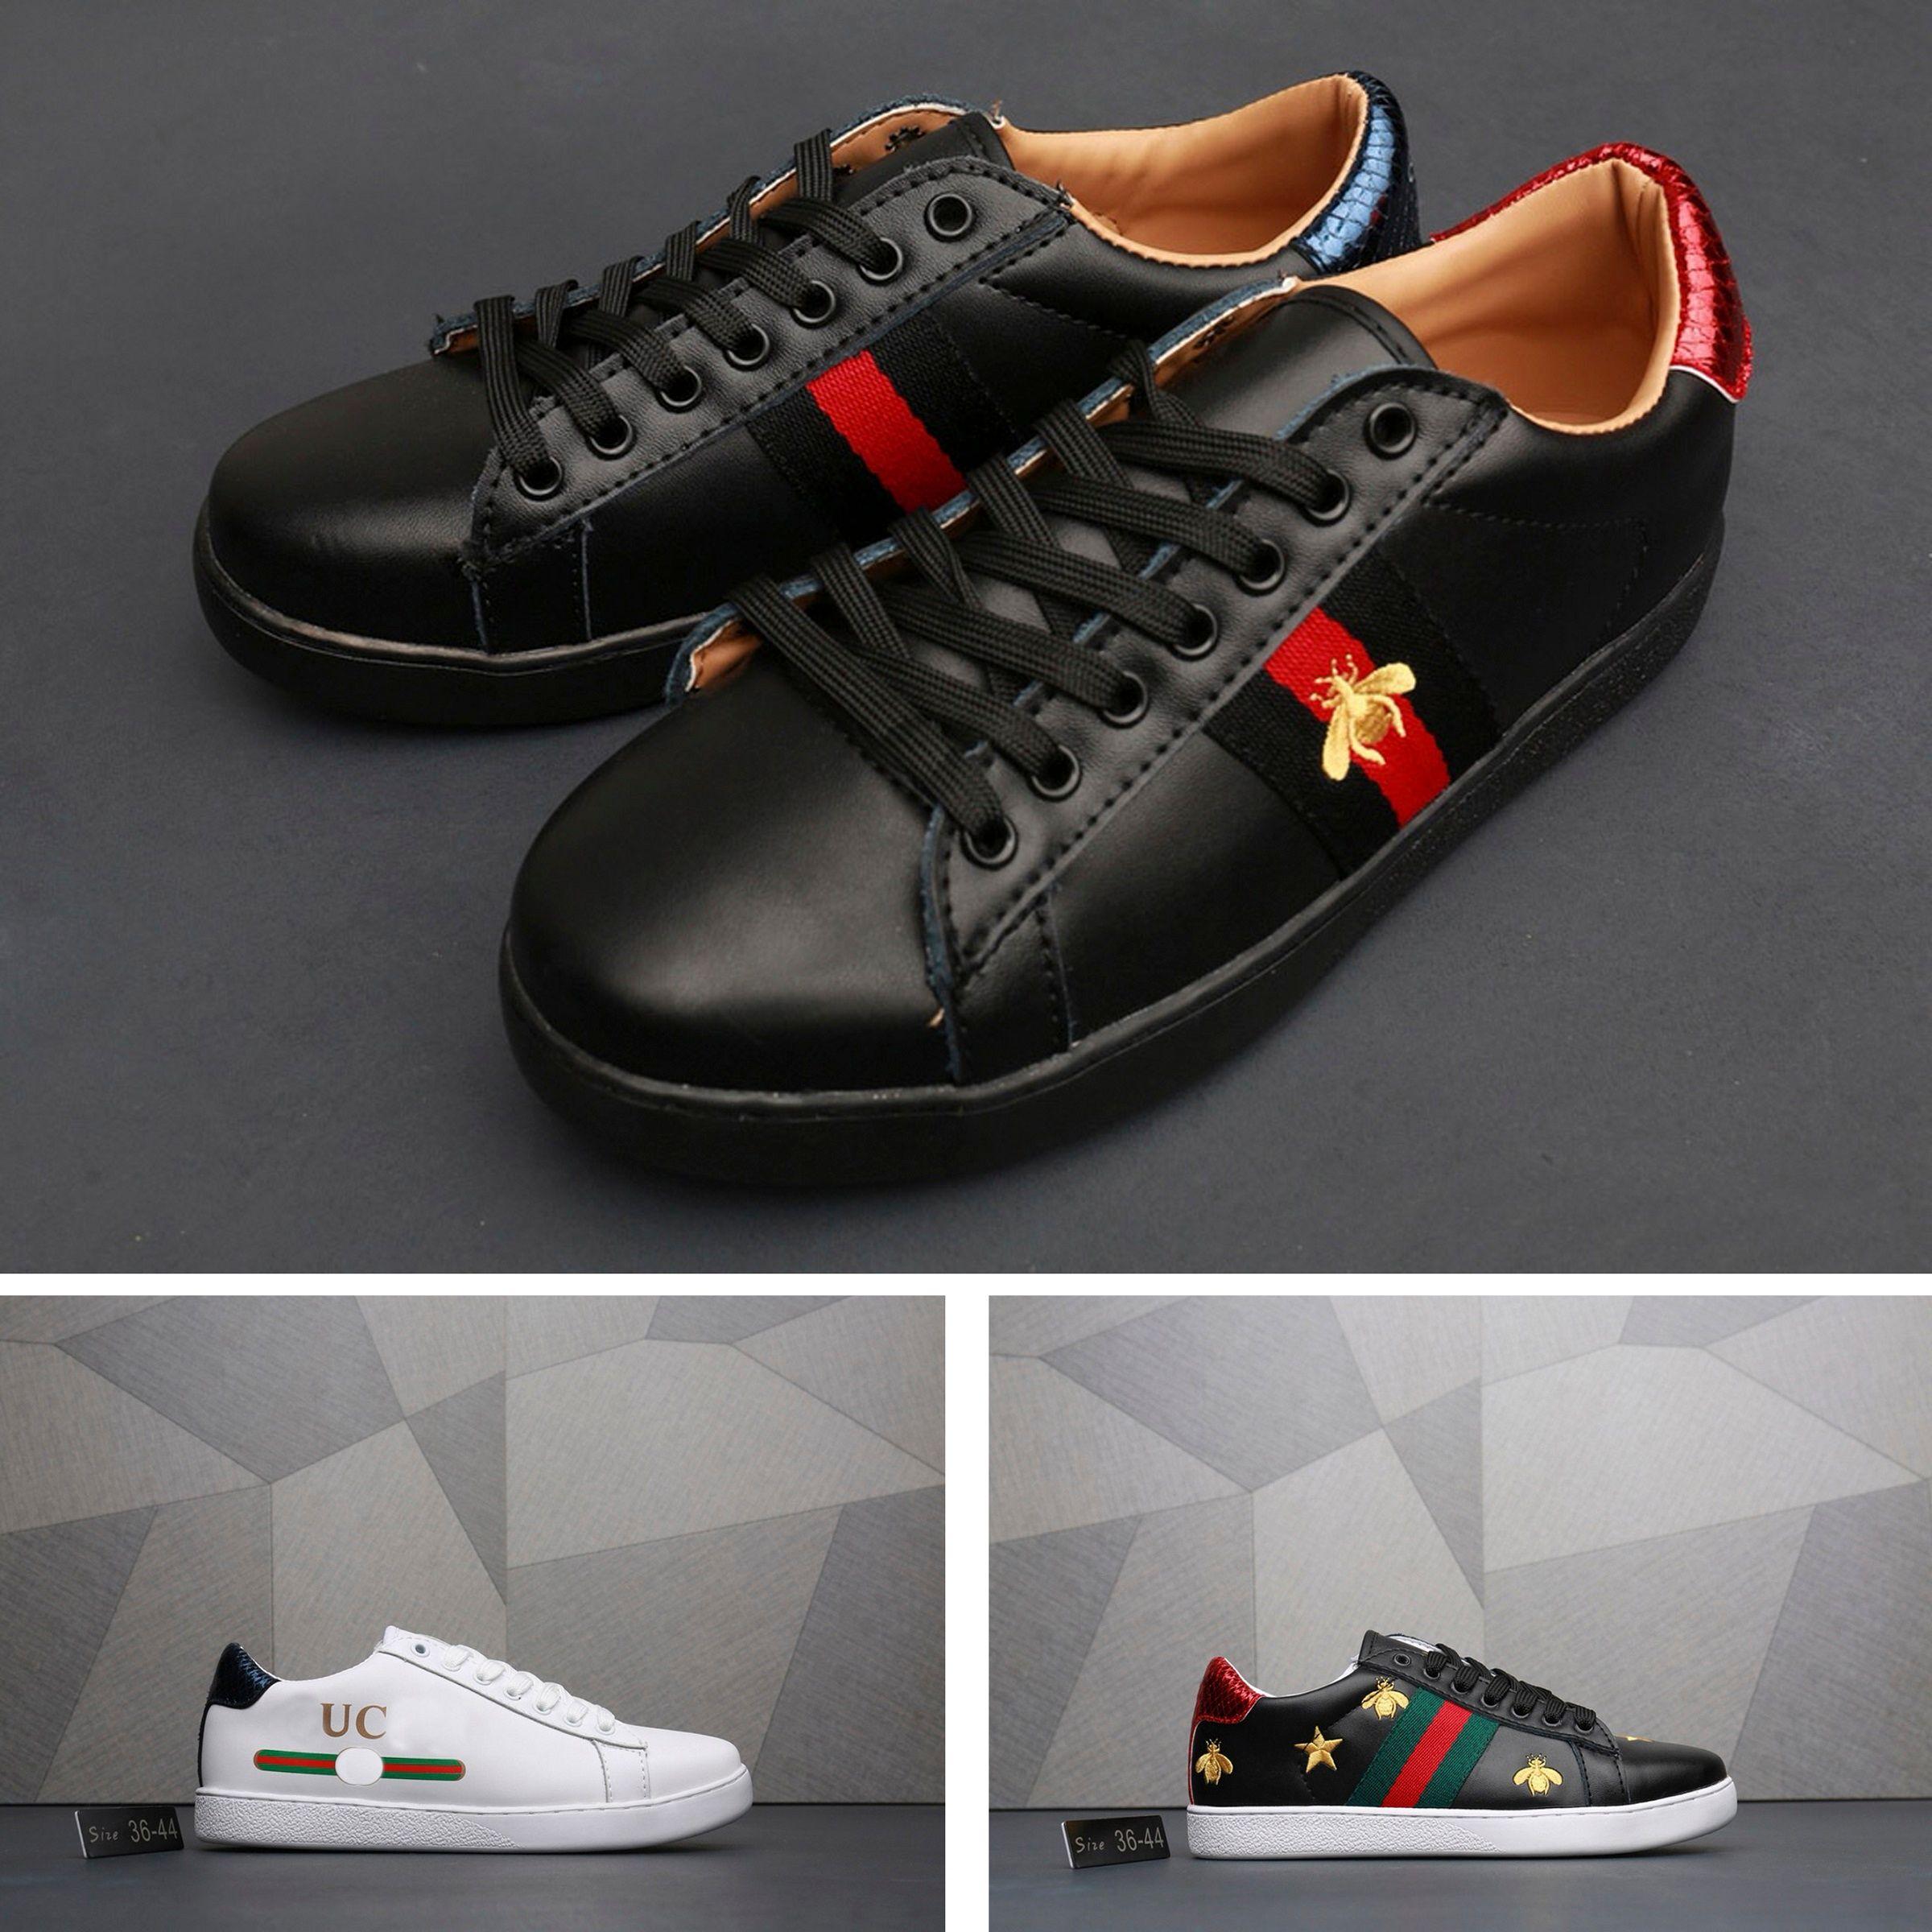 663910f56 Compre Gucci Women Shoes Gucci Sneakers Gucci Men Shoes A Mais Vendida  Marca De Luxo Europeu Tênis Sapatos Tênis De Couro De Pele De Carneiro  Ultra Suave ...